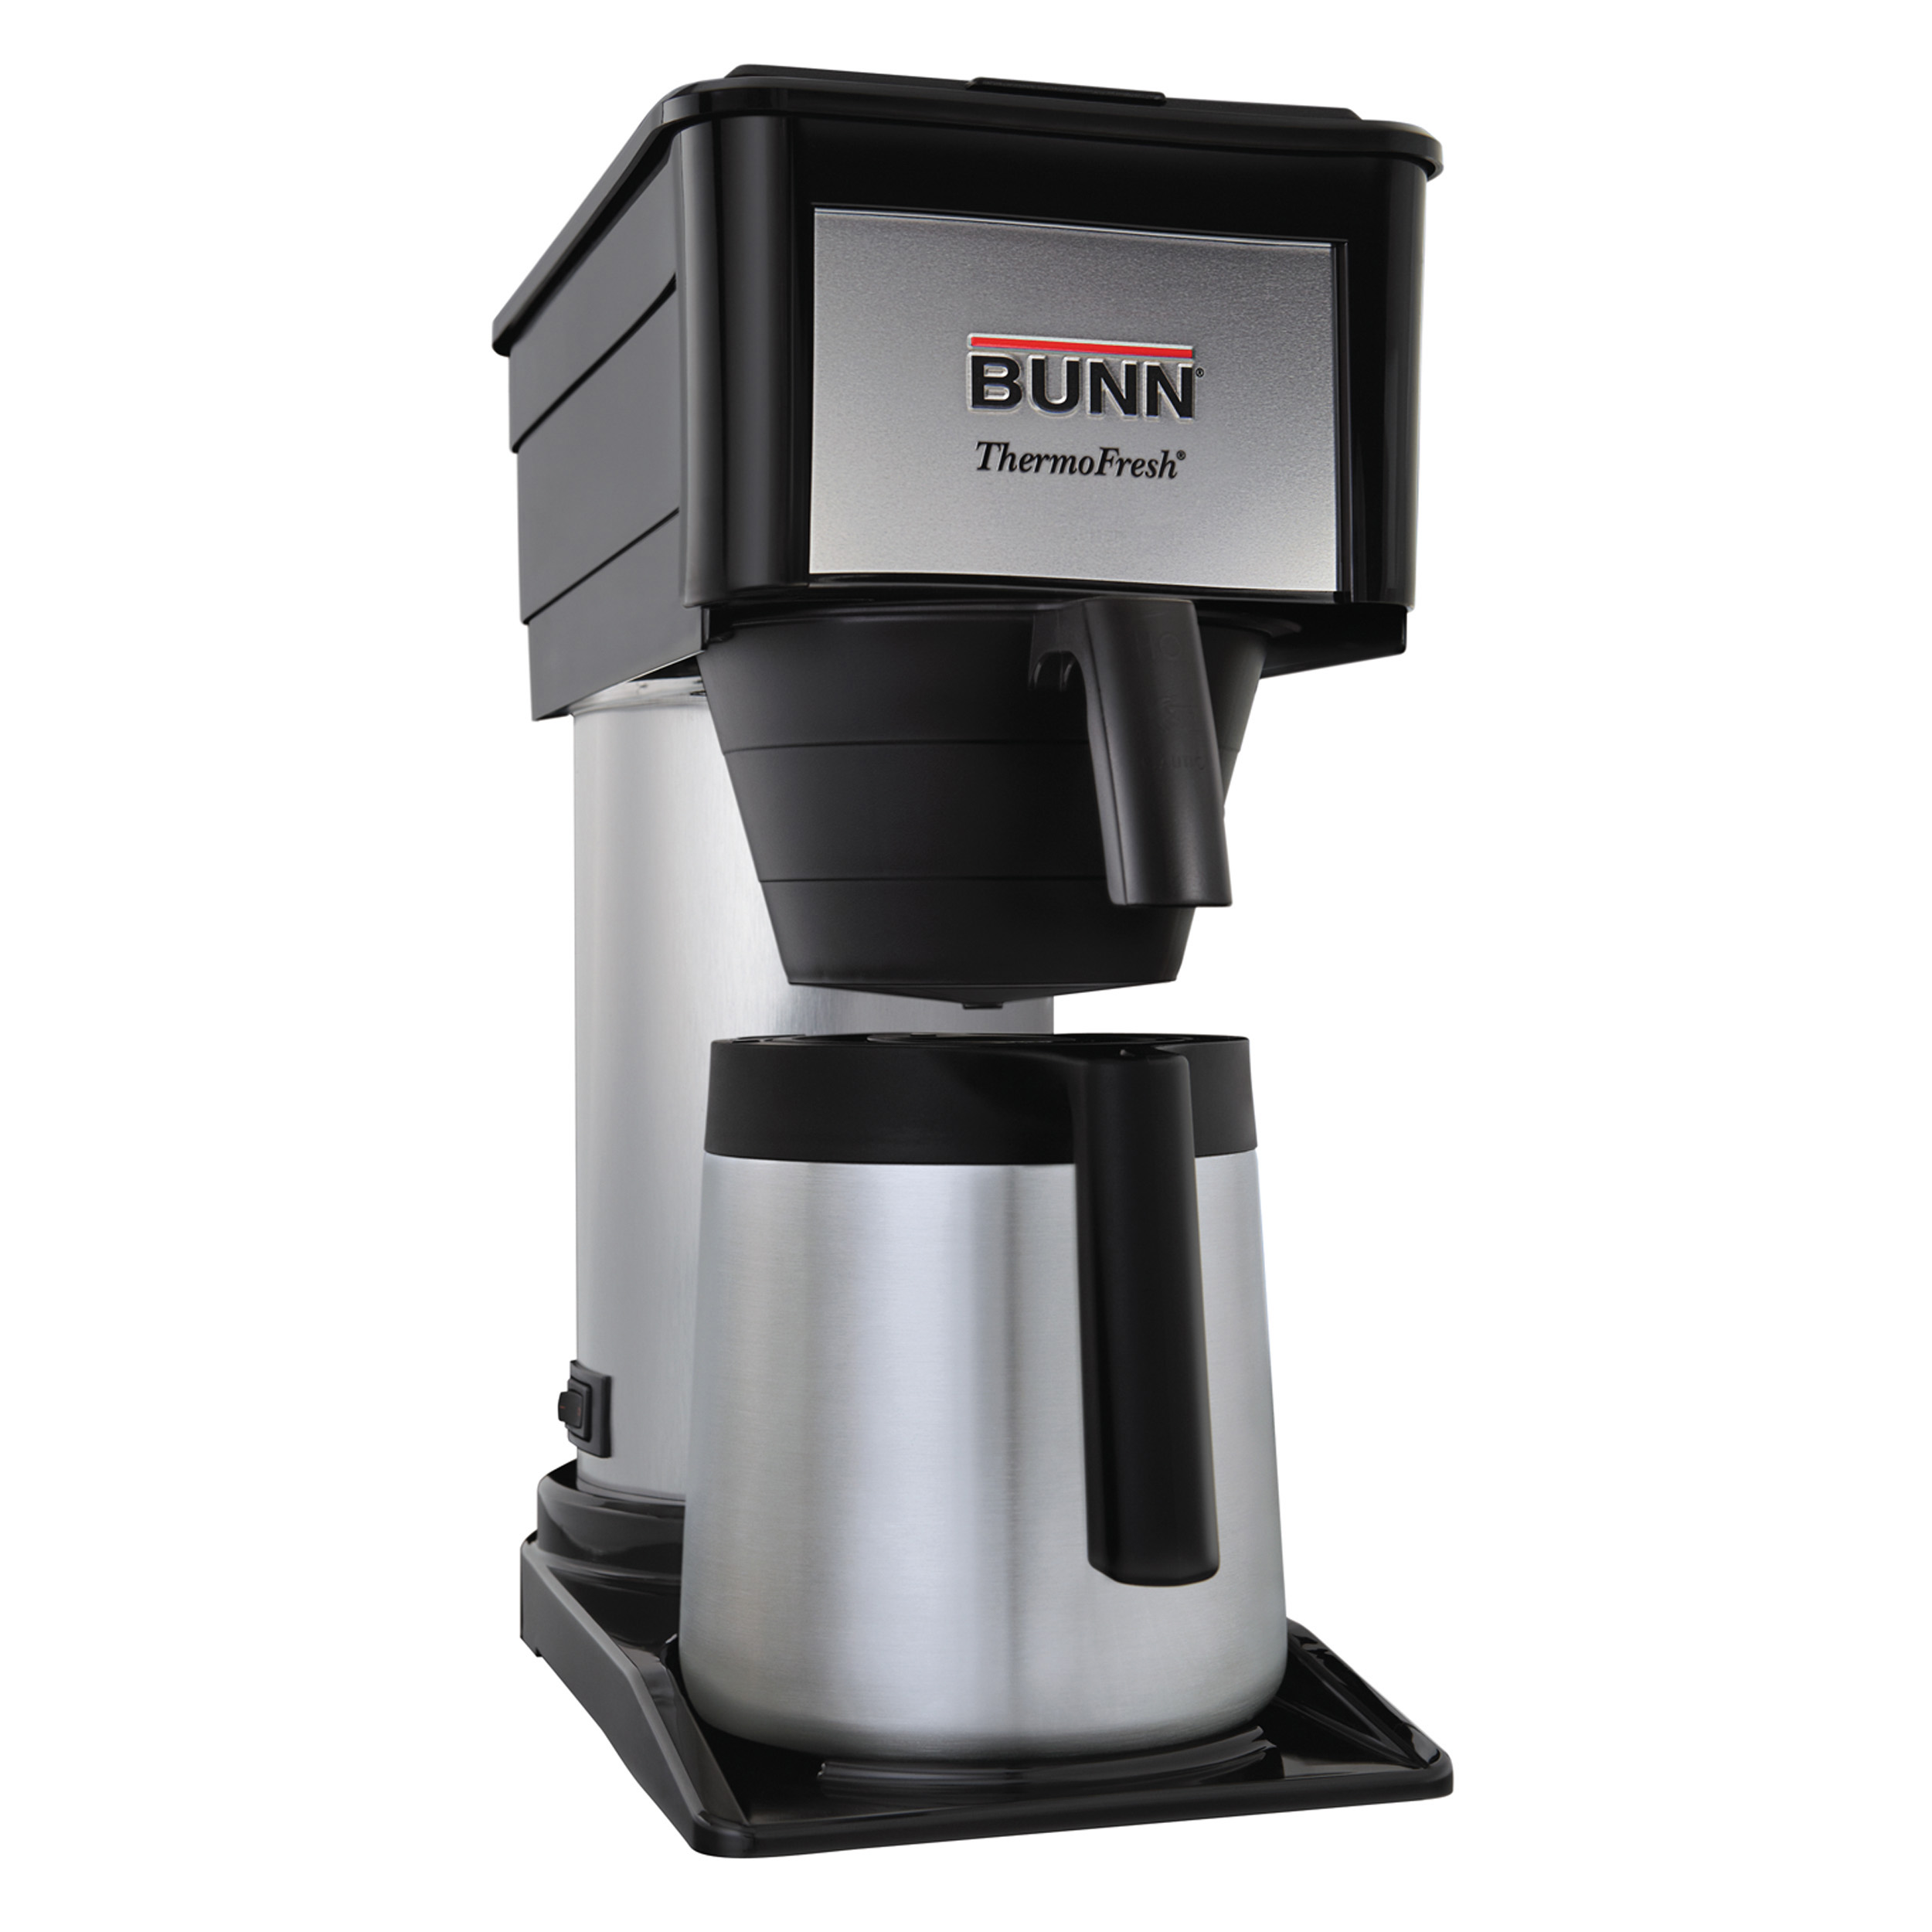 small resolution of bunn btx b thermofresh 10 cup home thermal carafe coffee brewer blackbunn model bx wiring diagram